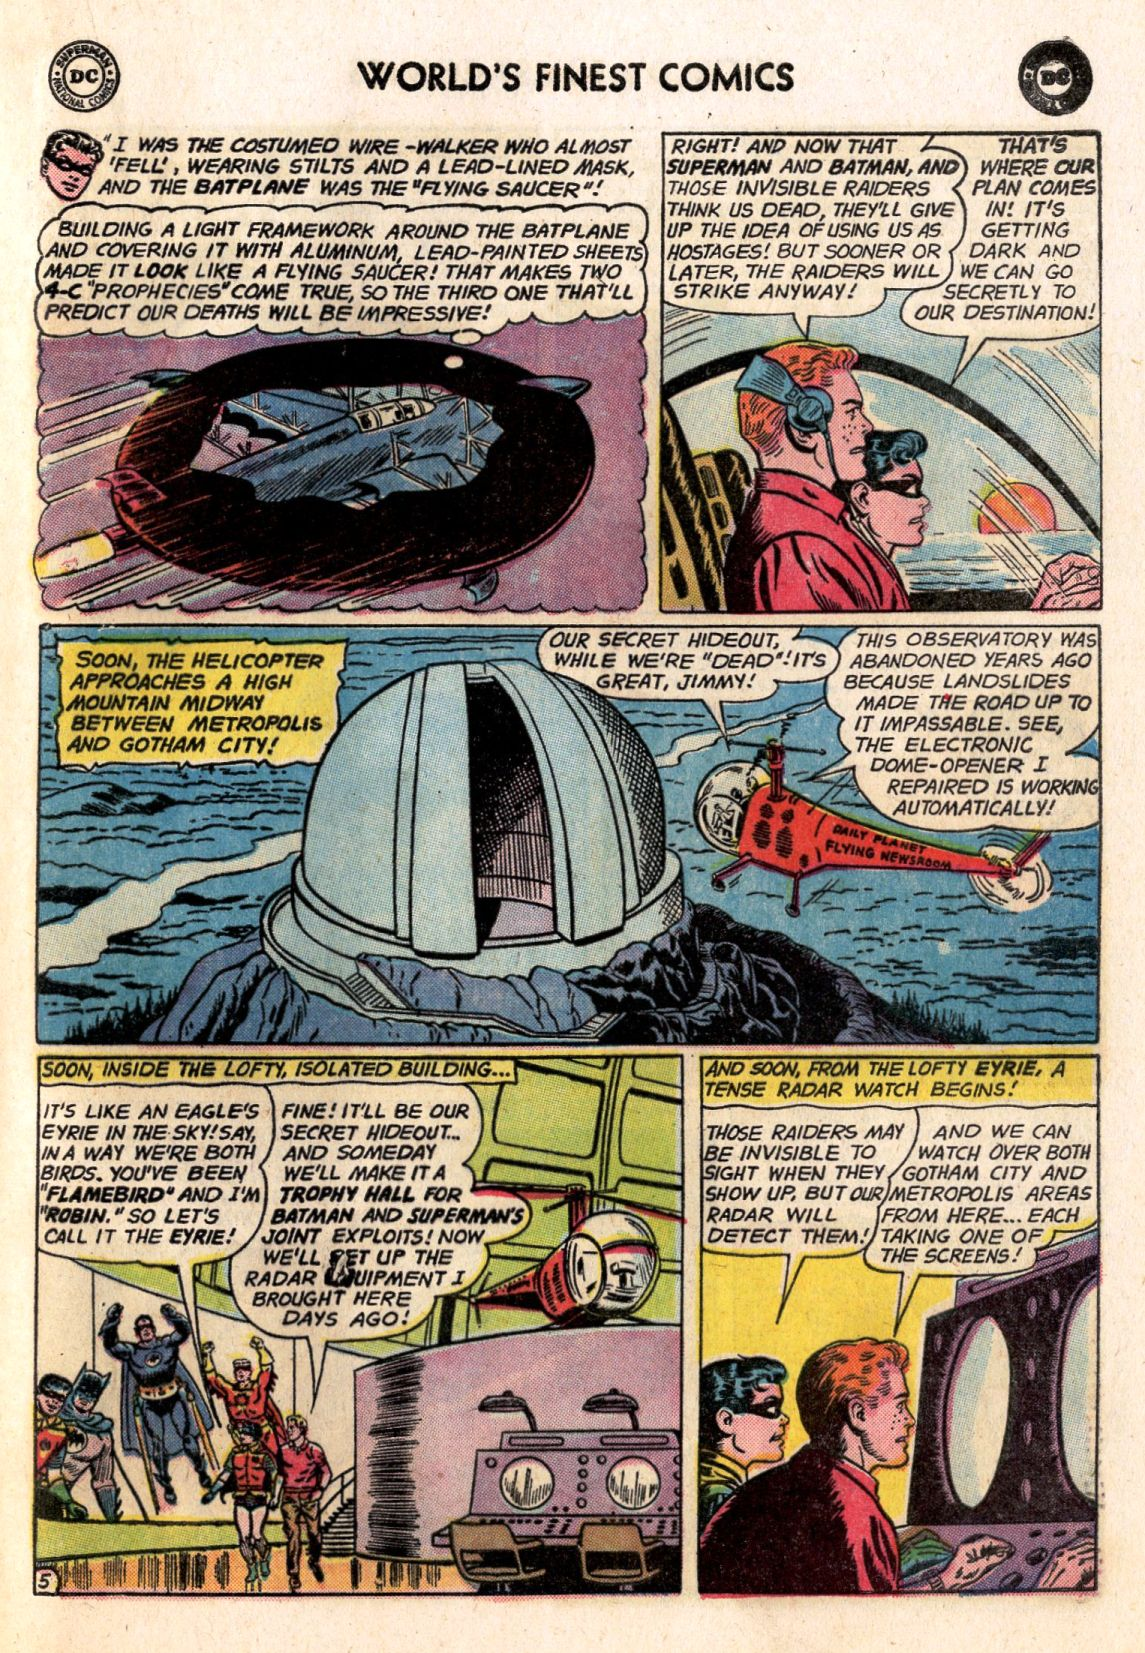 Read online World's Finest Comics comic -  Issue #141 - 17